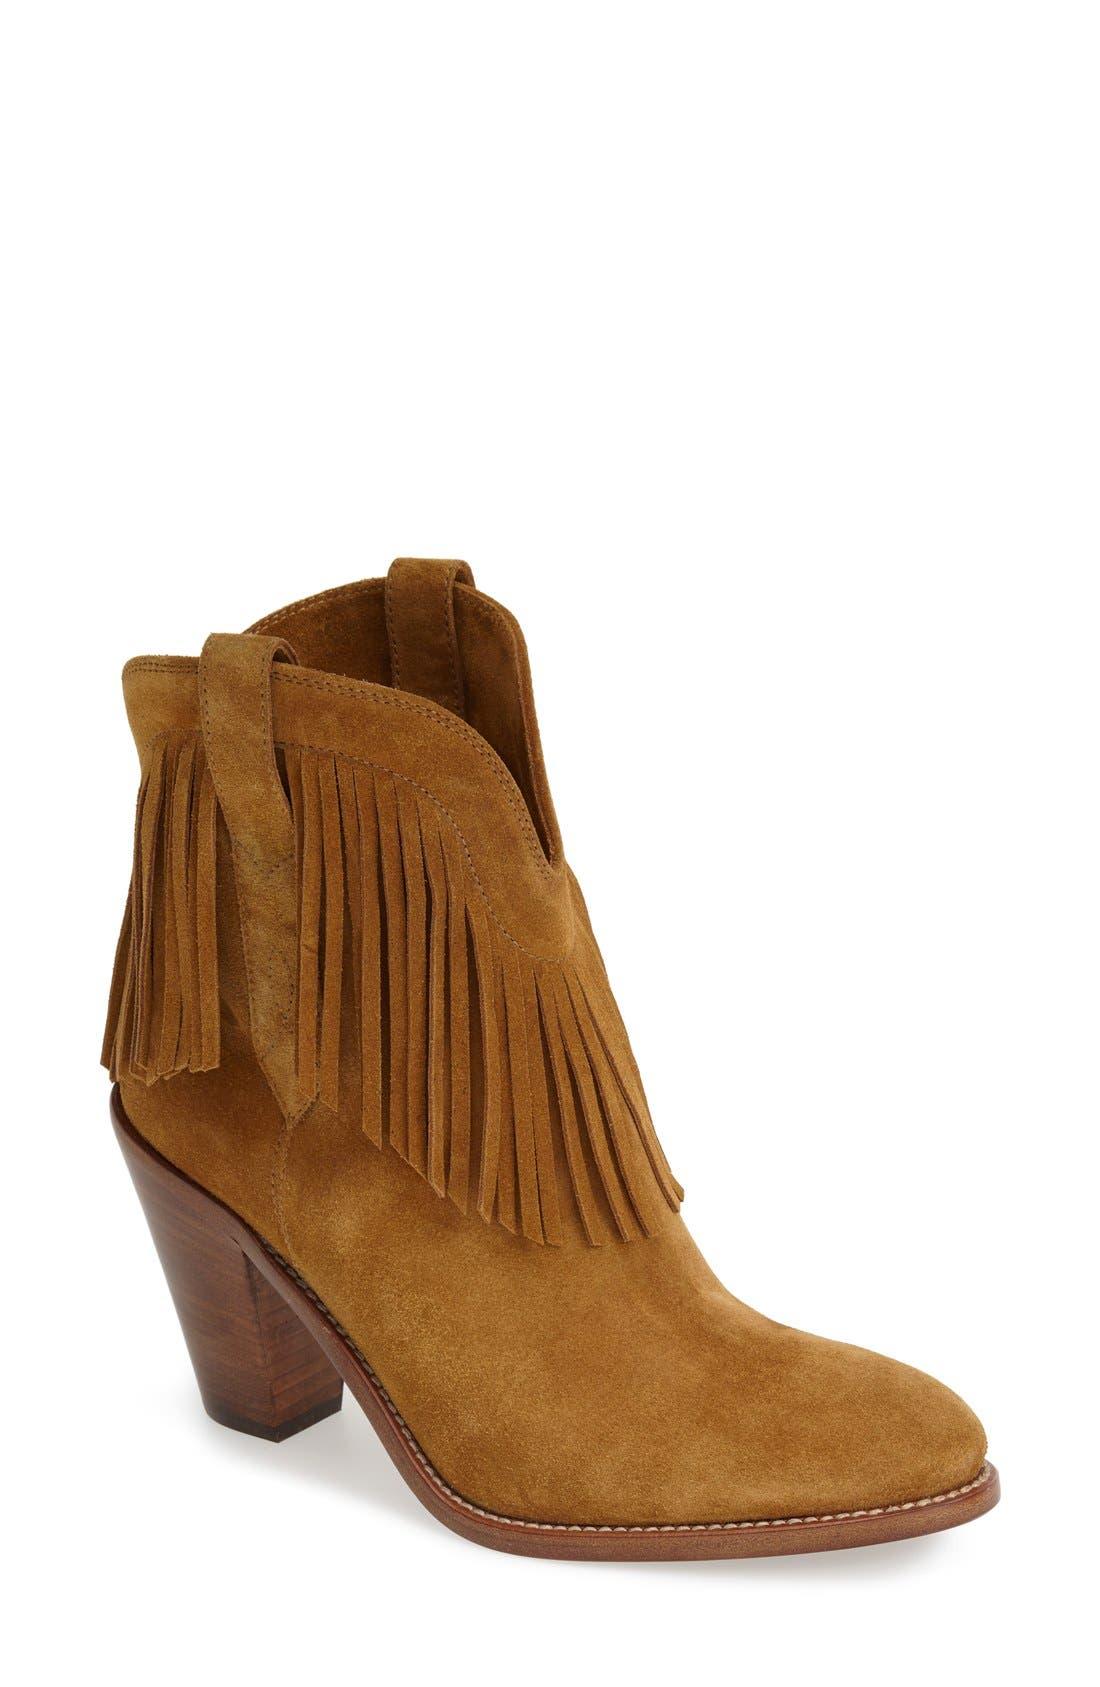 Alternate Image 1 Selected - Saint Laurent 'New Western' Fringe Boot (Women)